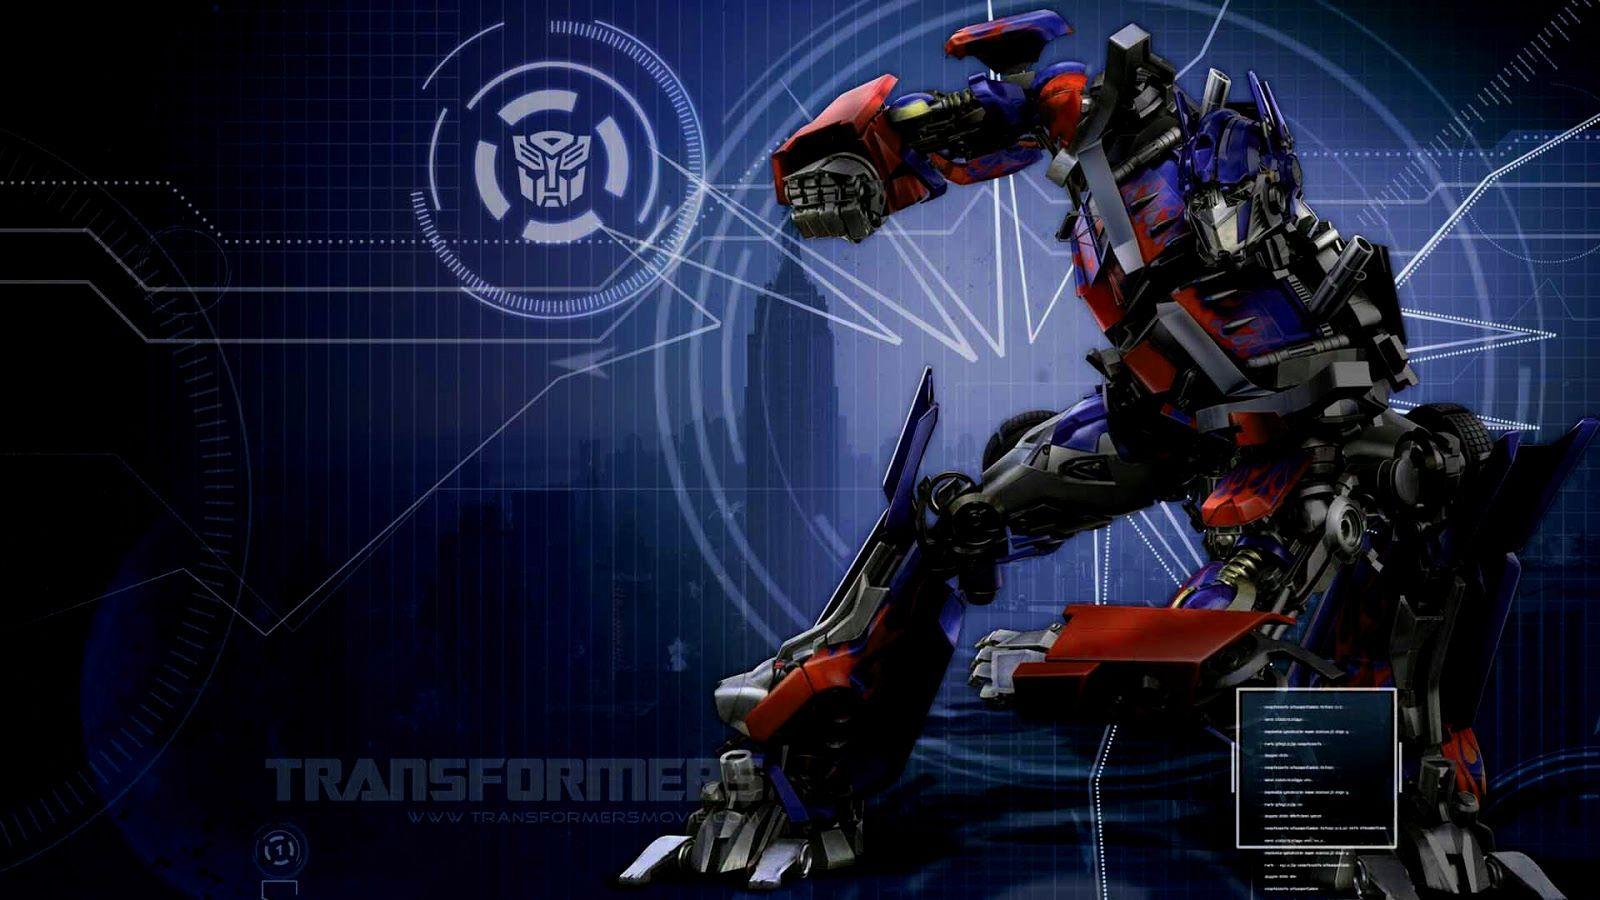 Walpaper Hd Keren Transformers Movie Gambar Transformers